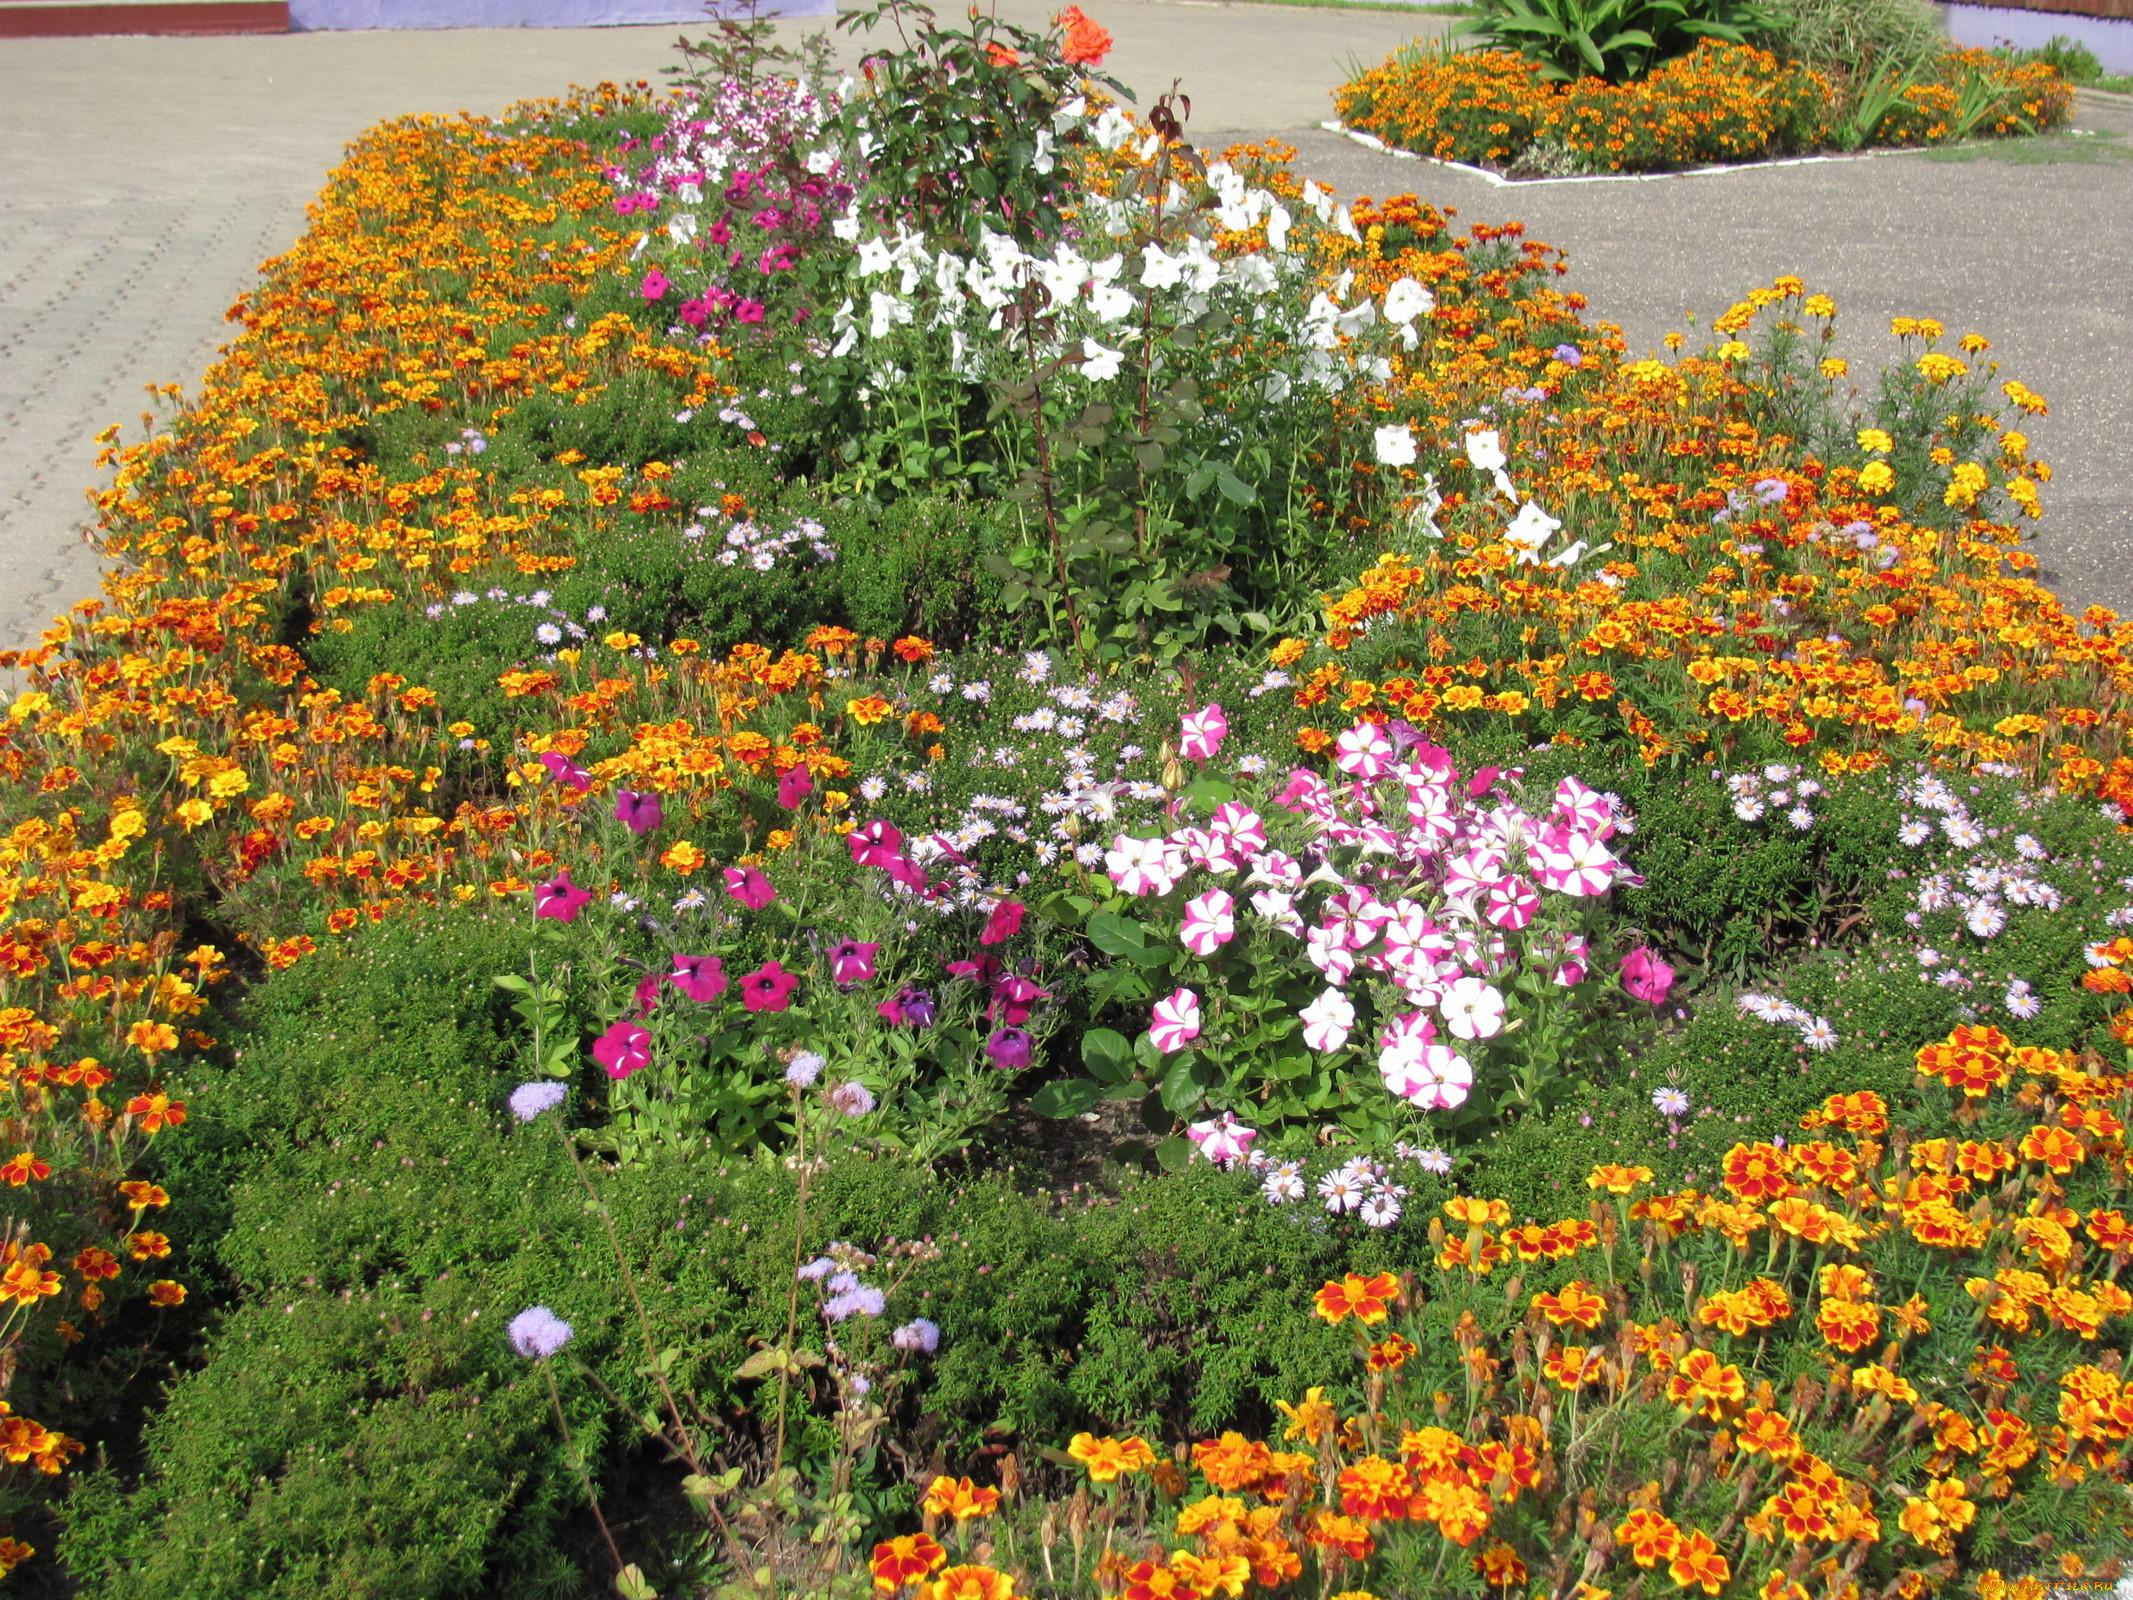 Клумба с цветами петунии и бархатцев фото